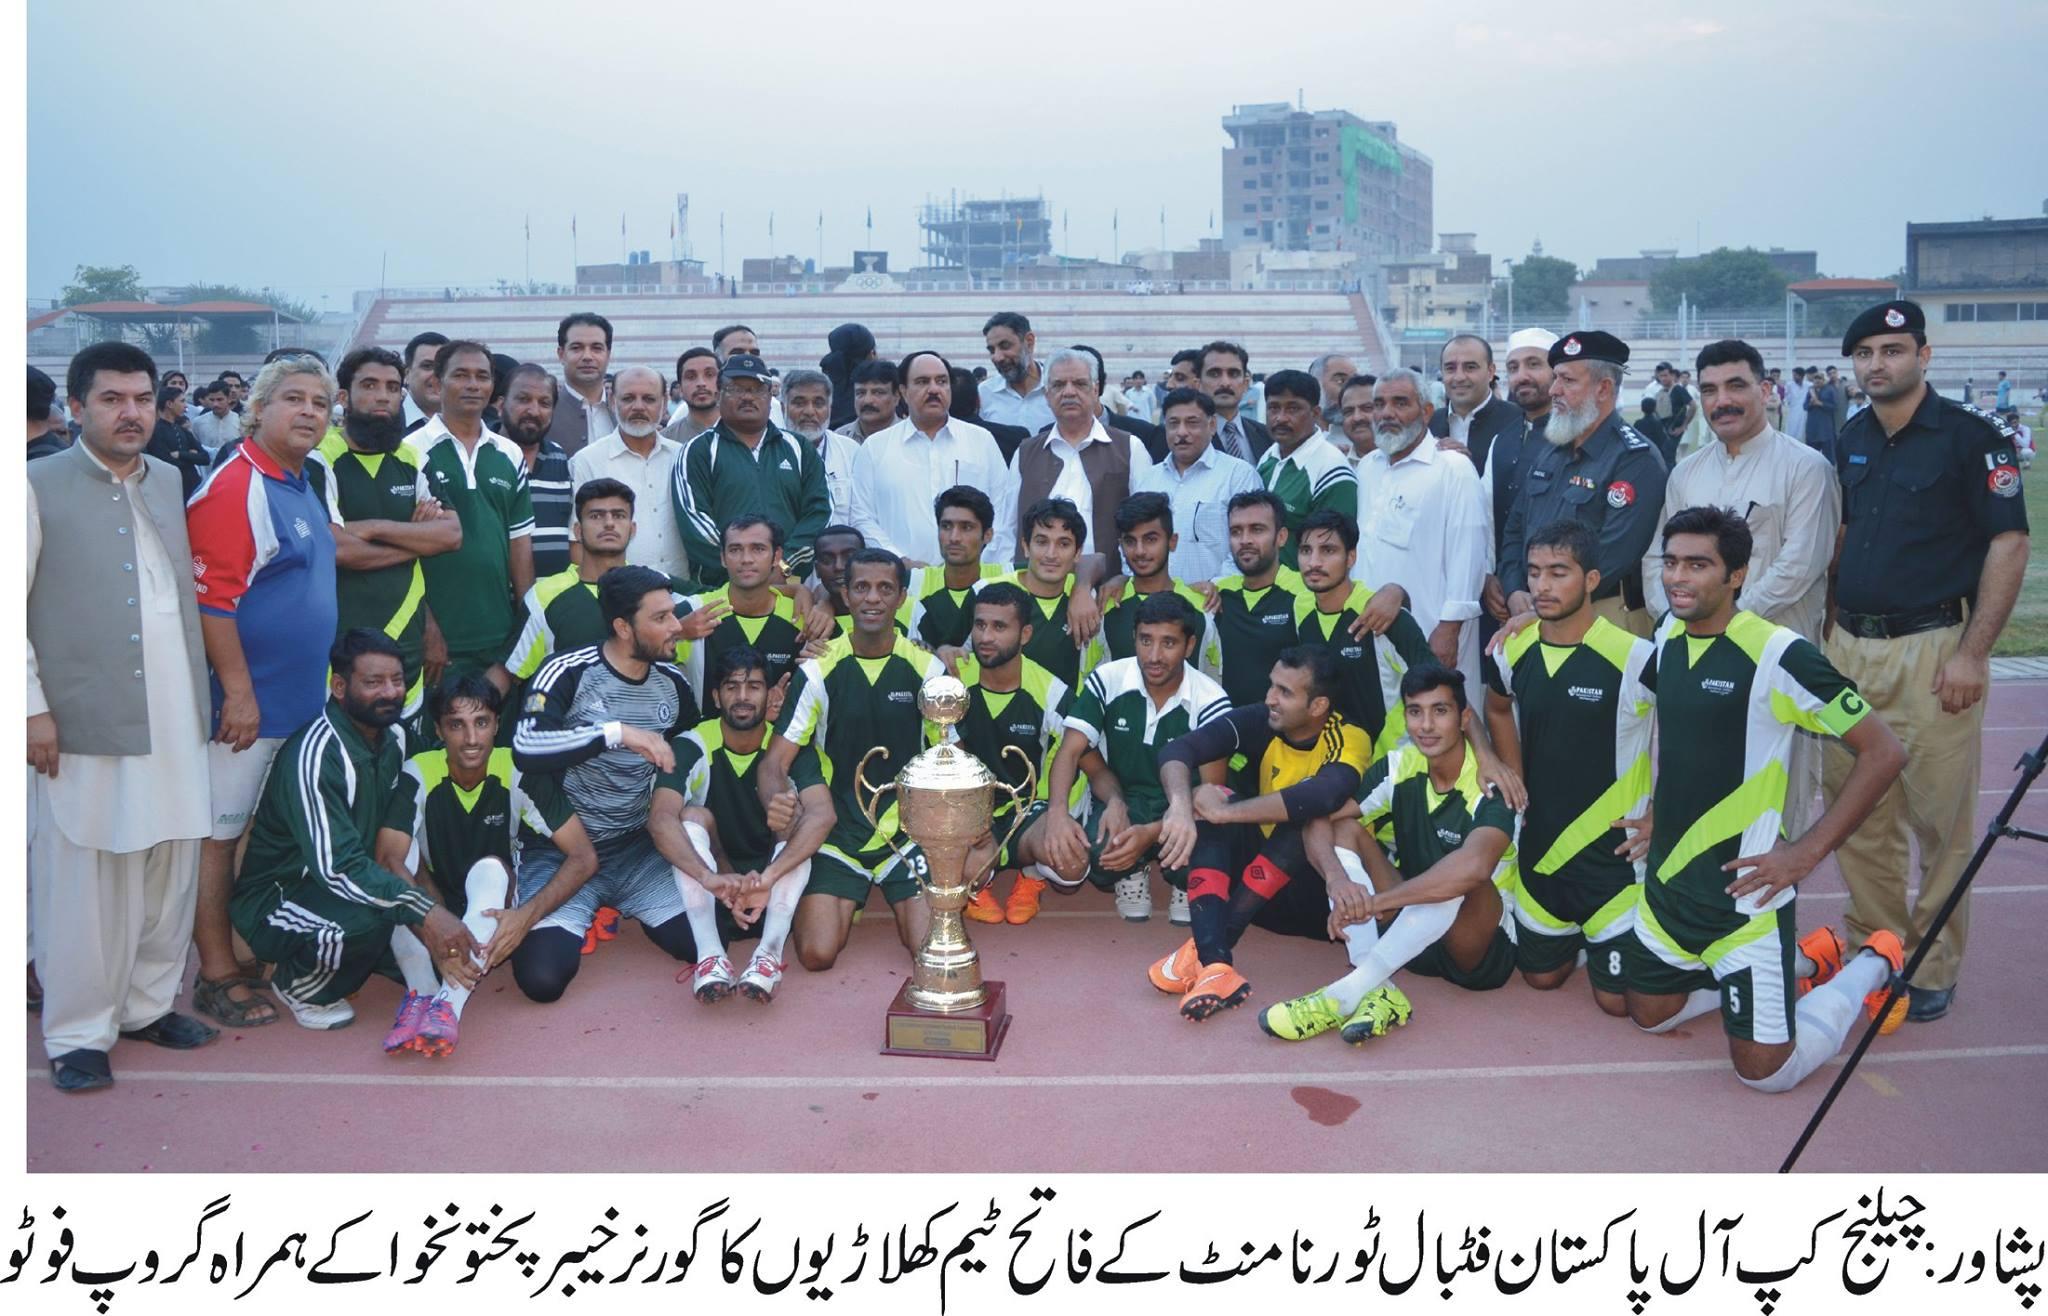 pia-celebrate-all-pakistan-shama-challenge-cup-2016-in-peshawar